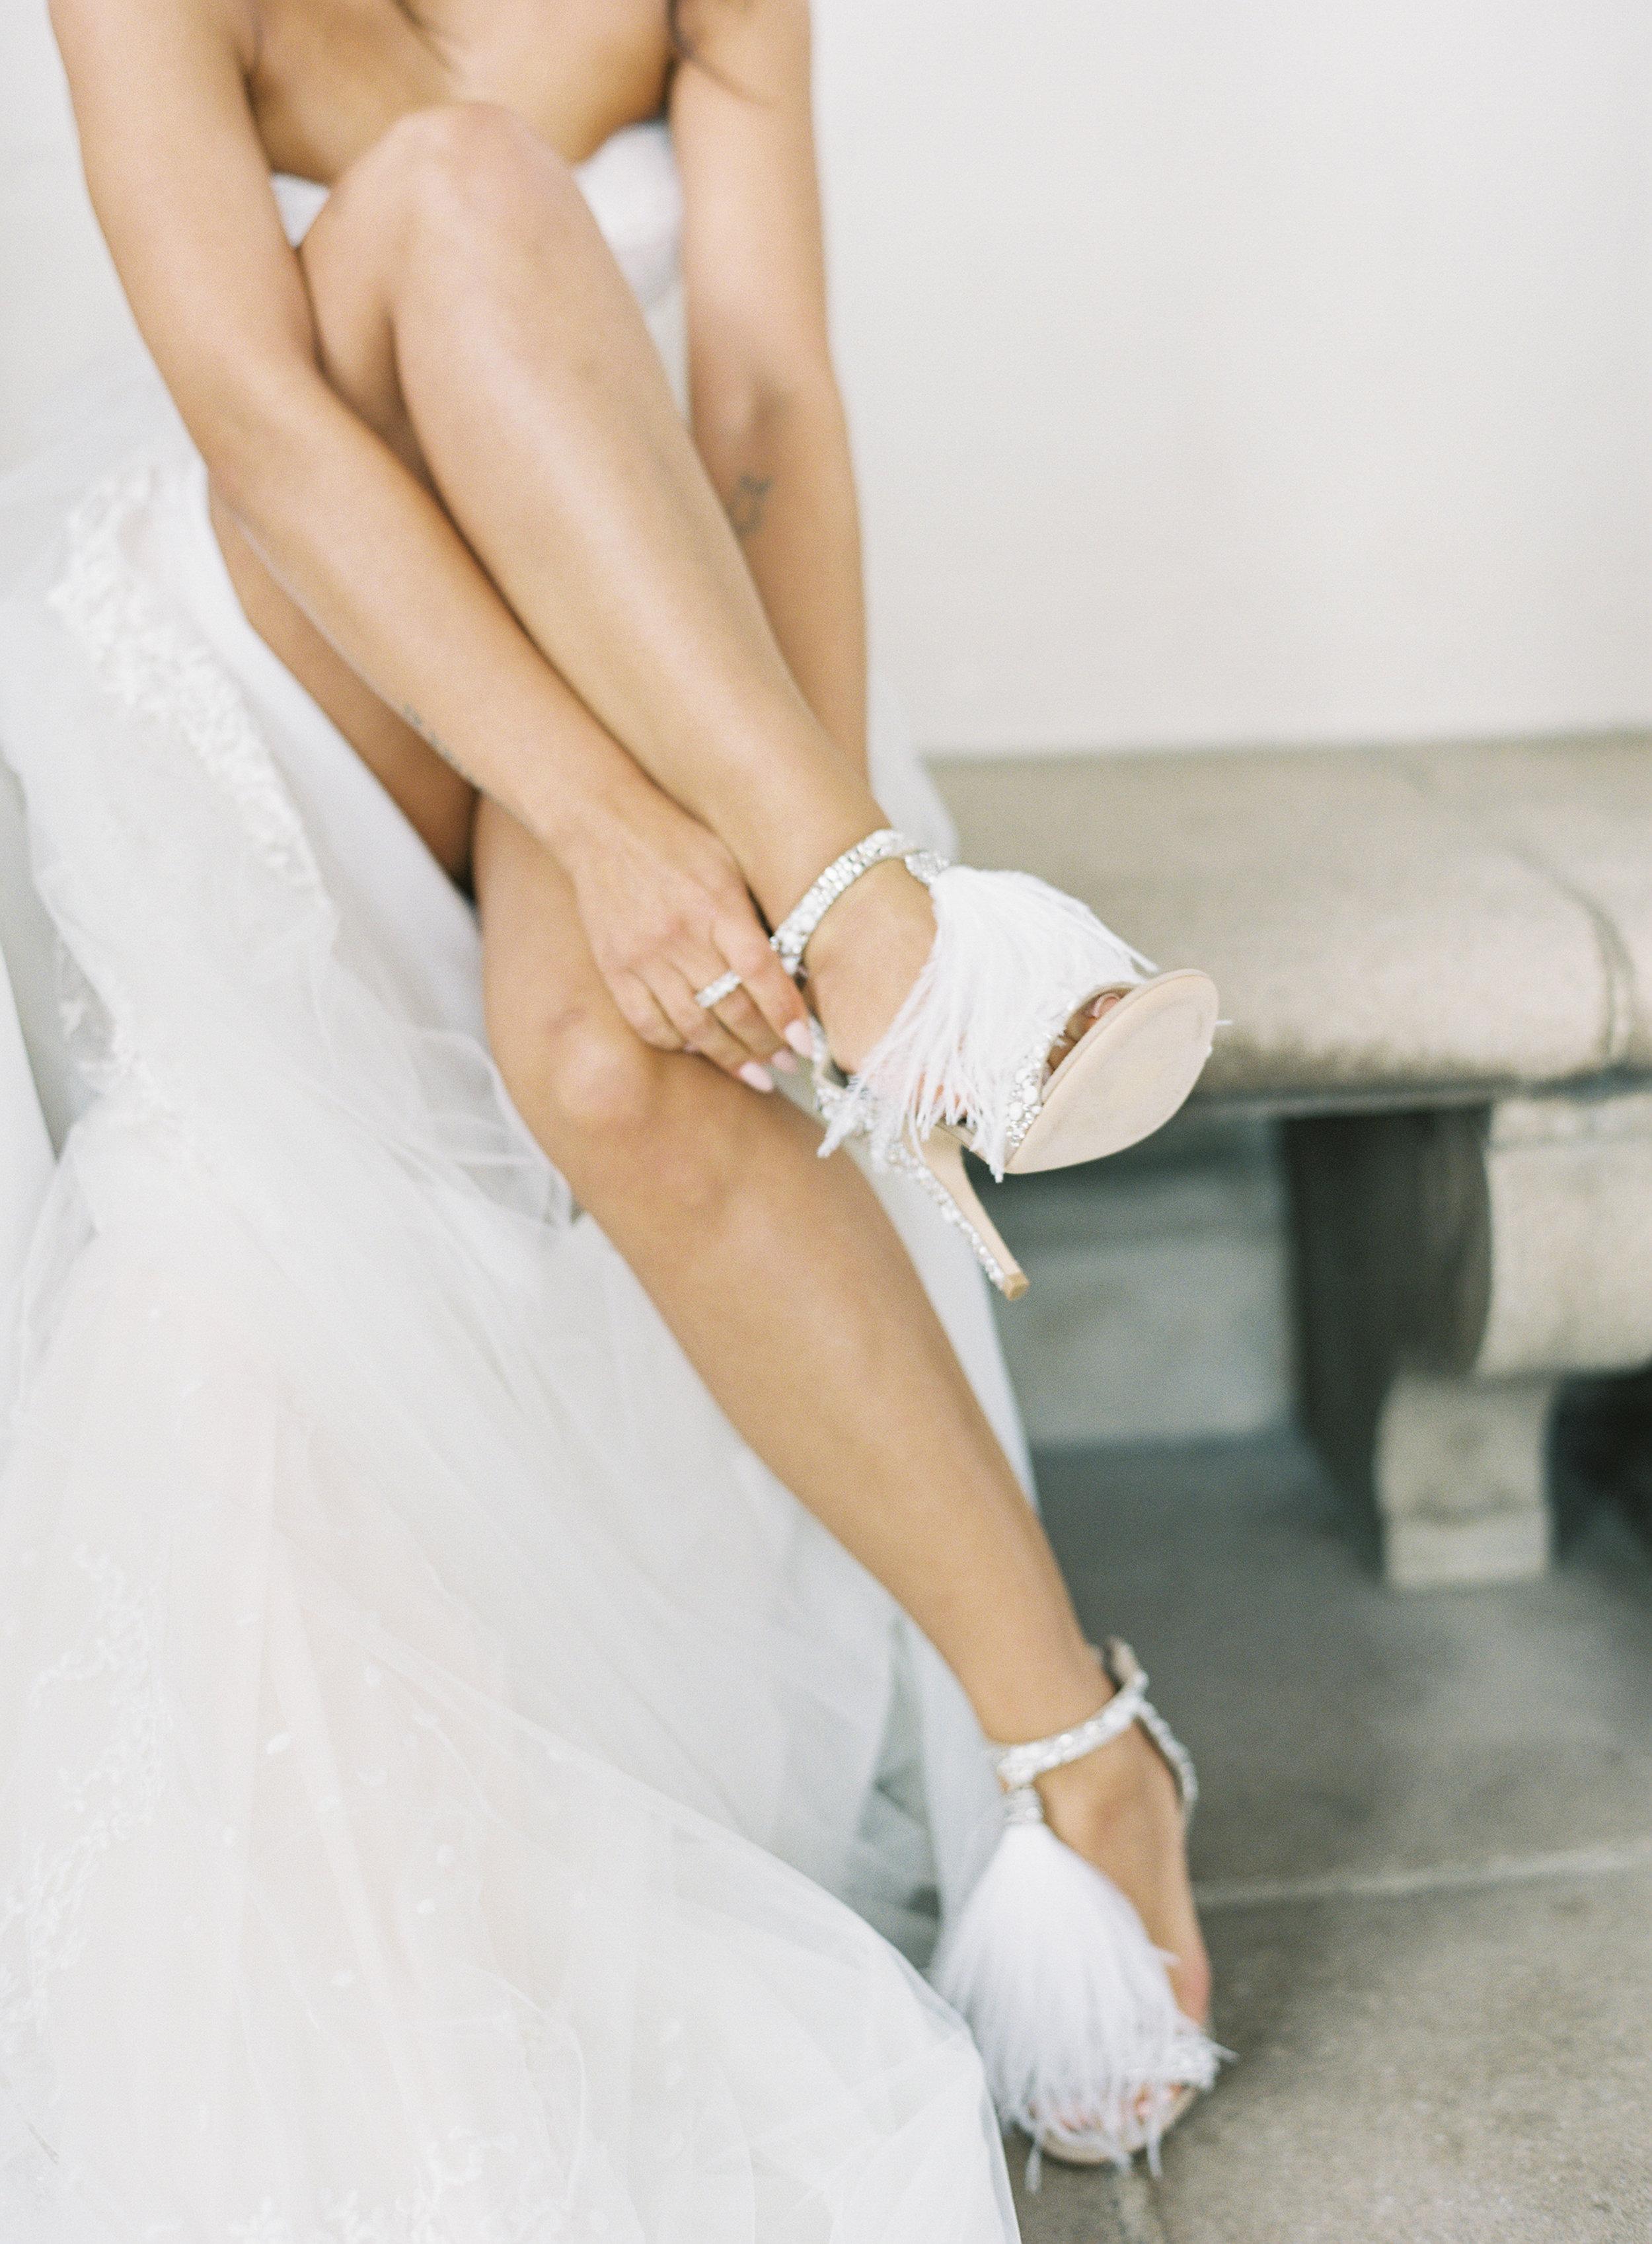 Athenaeum_Wedding_Hi_Res-11-Jen_Huang-005190-R1-006.jpg